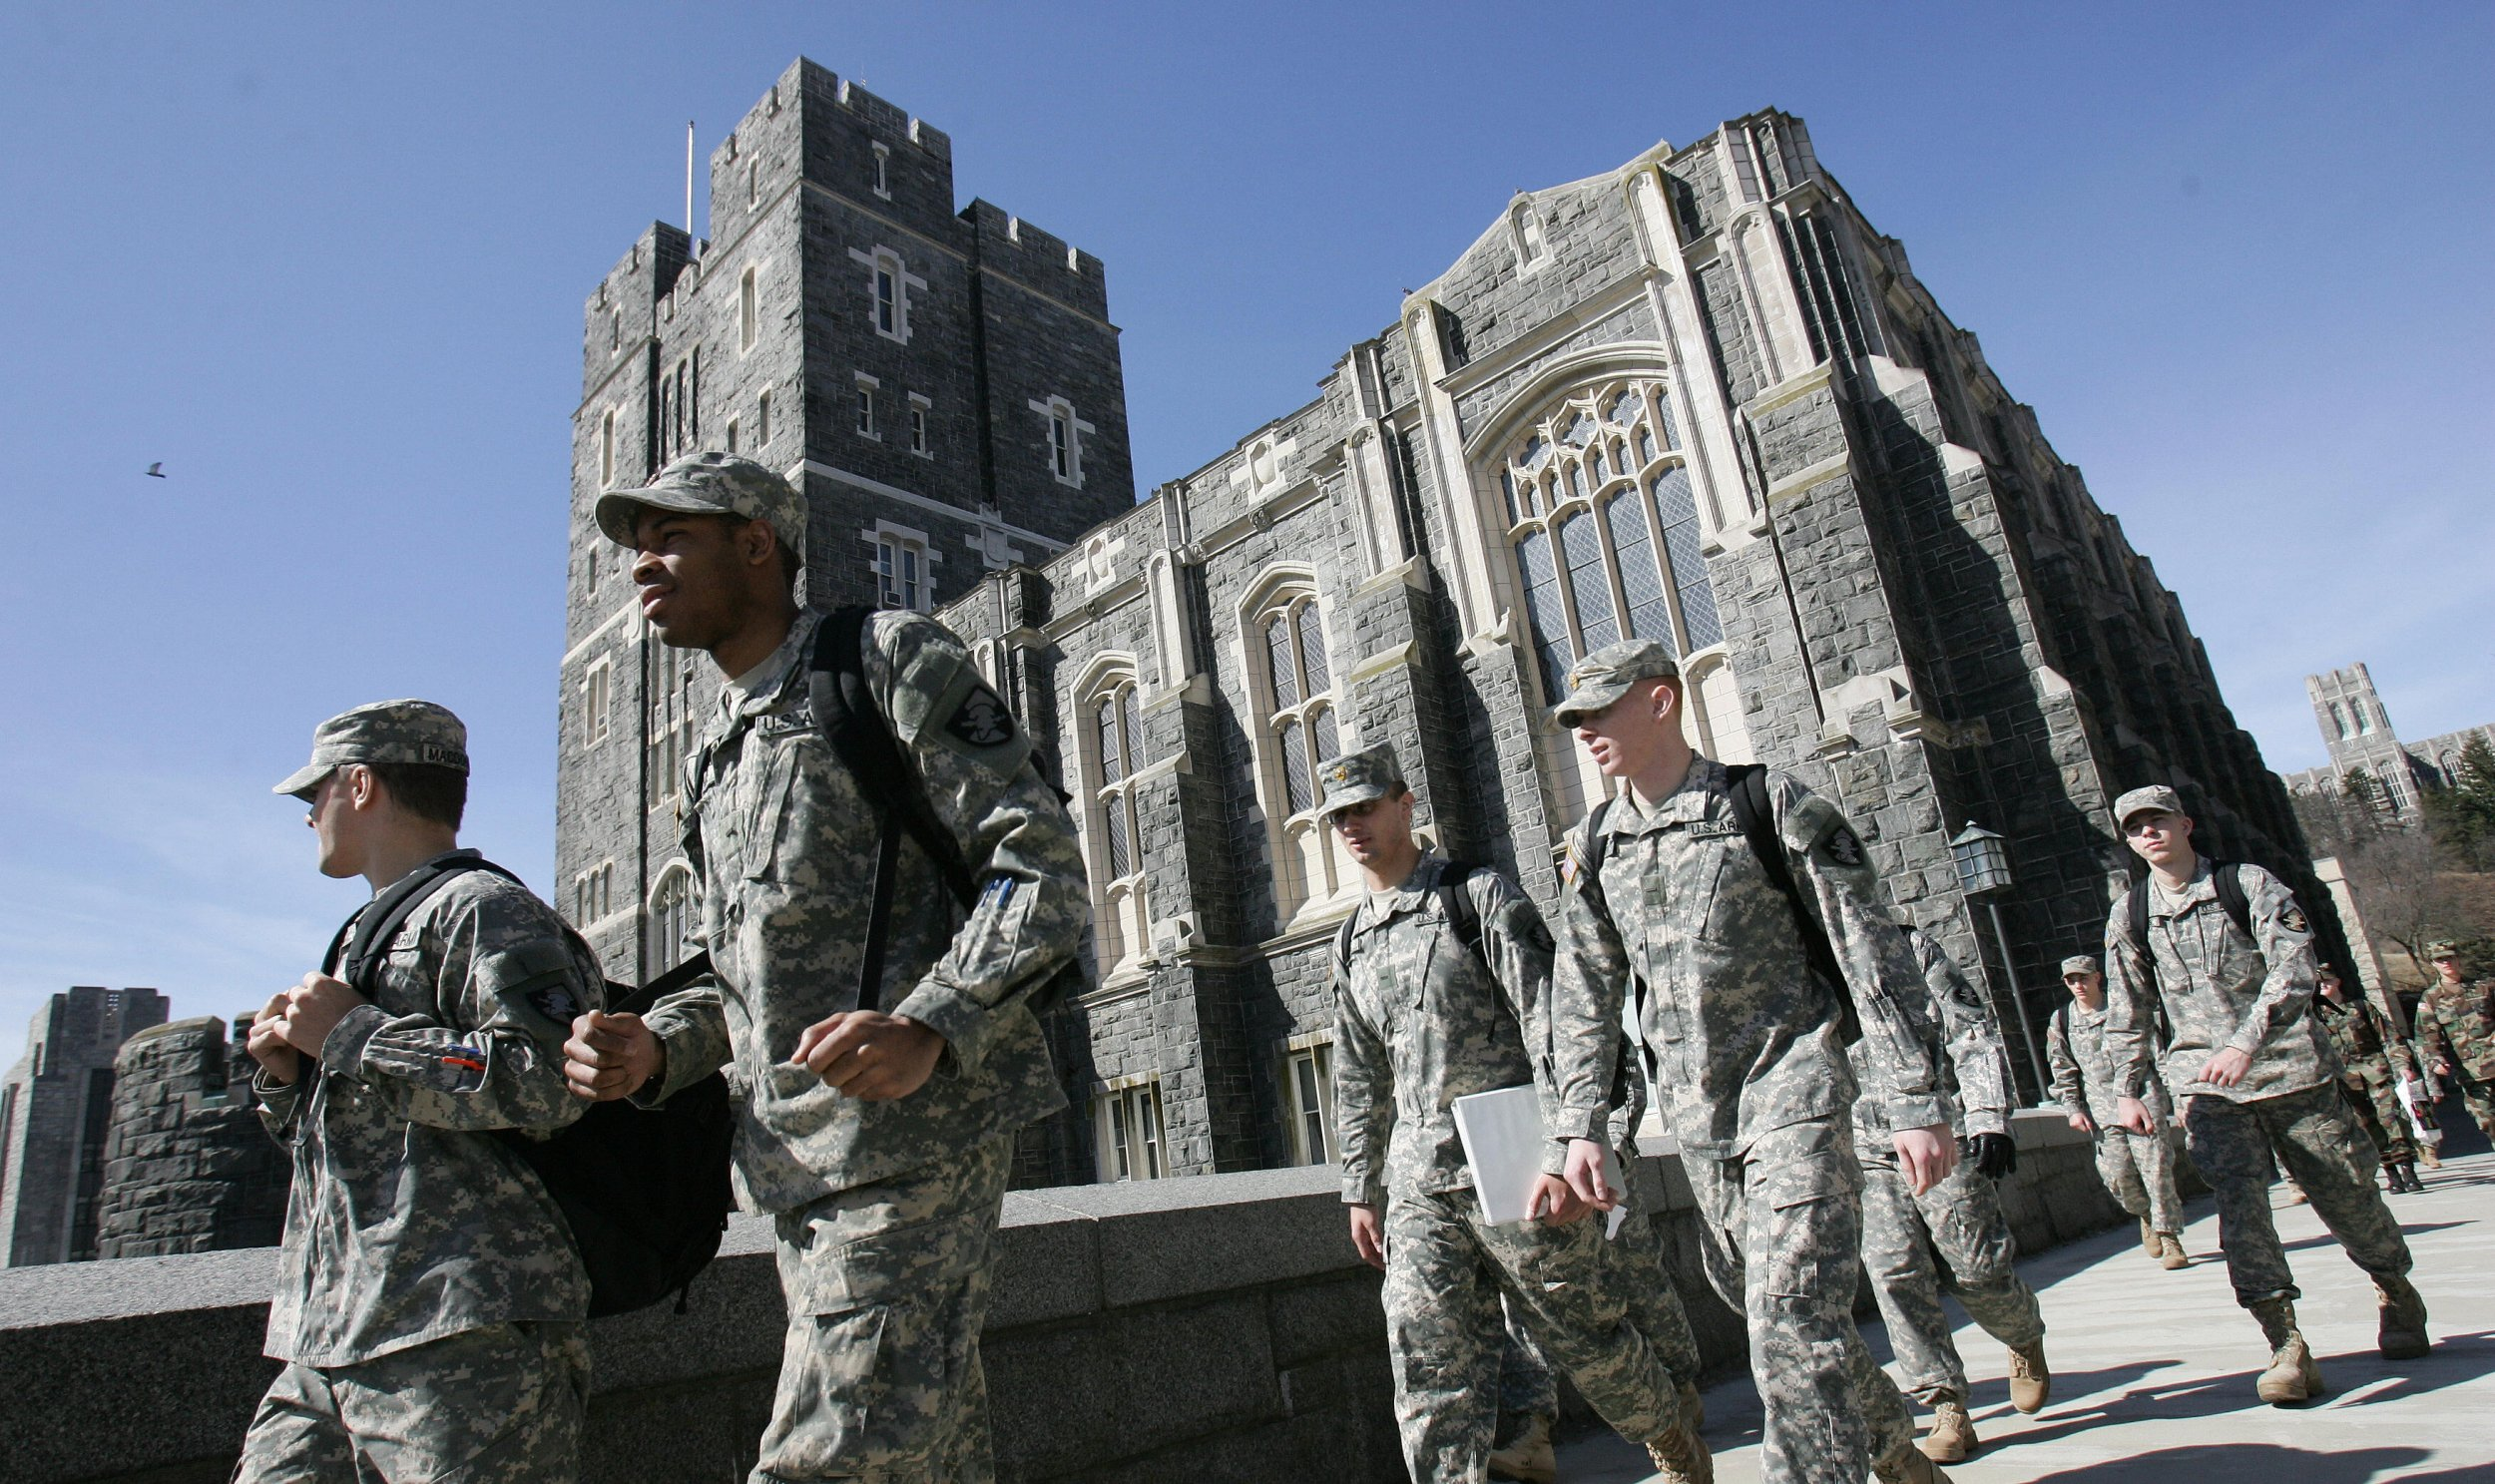 West Point Should Rename Its Robert E Lee Barracks